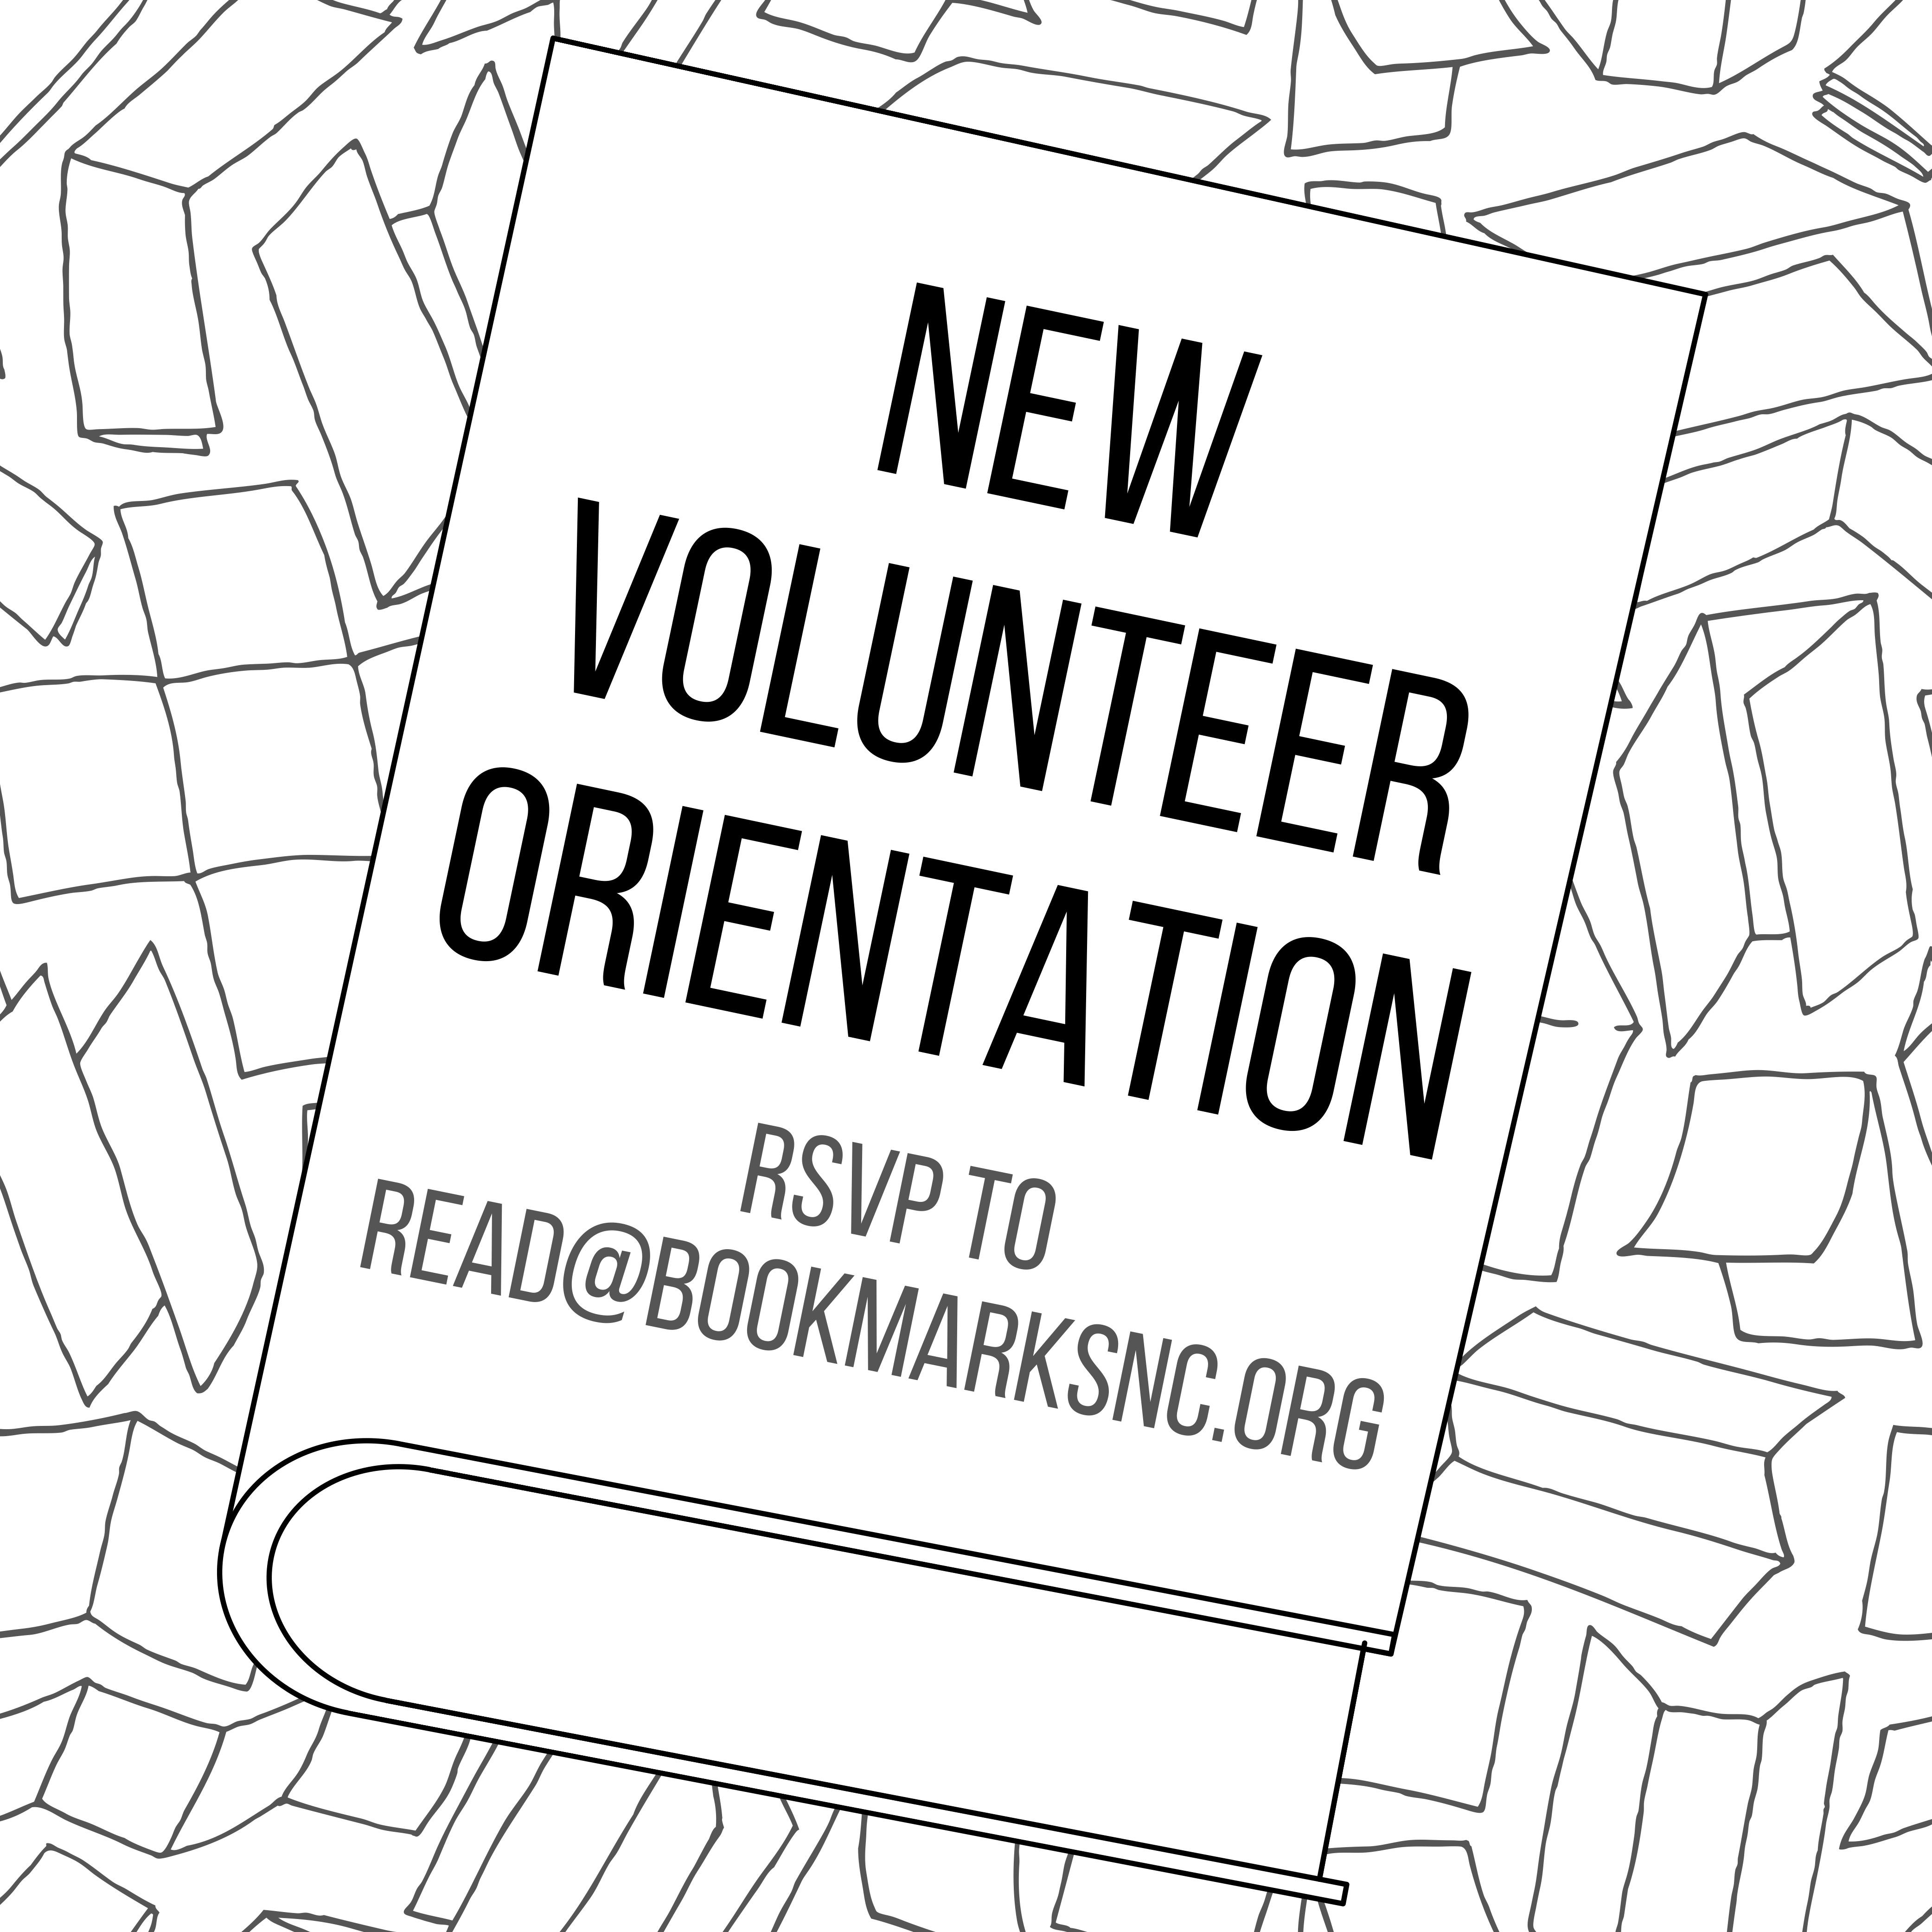 New Volunteer Orientation at Bookmarks